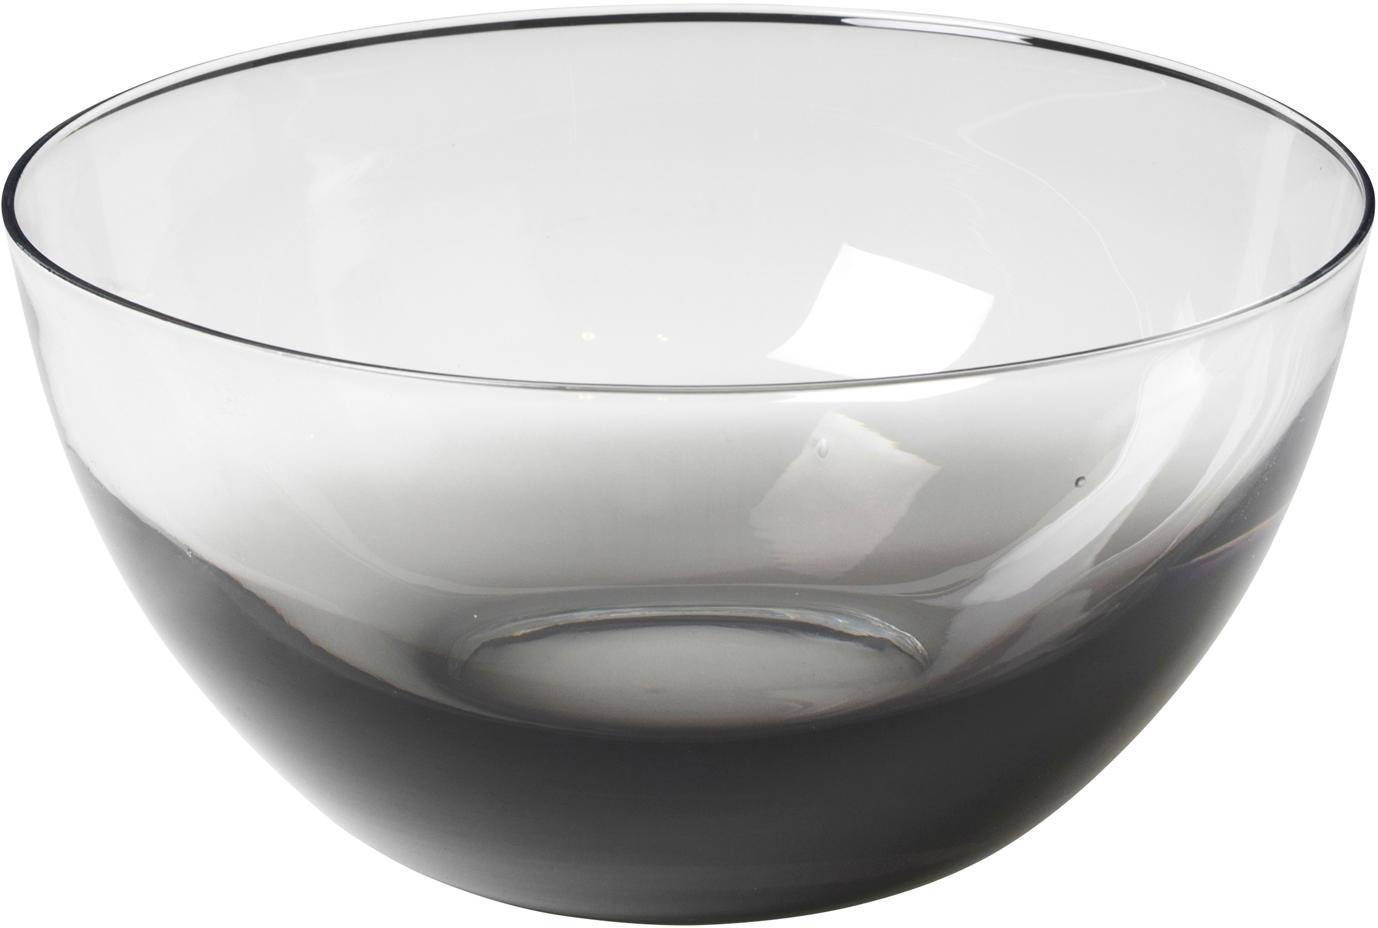 Mundgeblasene Schüssel Smoke, Glas, Rauchgrau, transparent, Ø 25 x H 12 cm